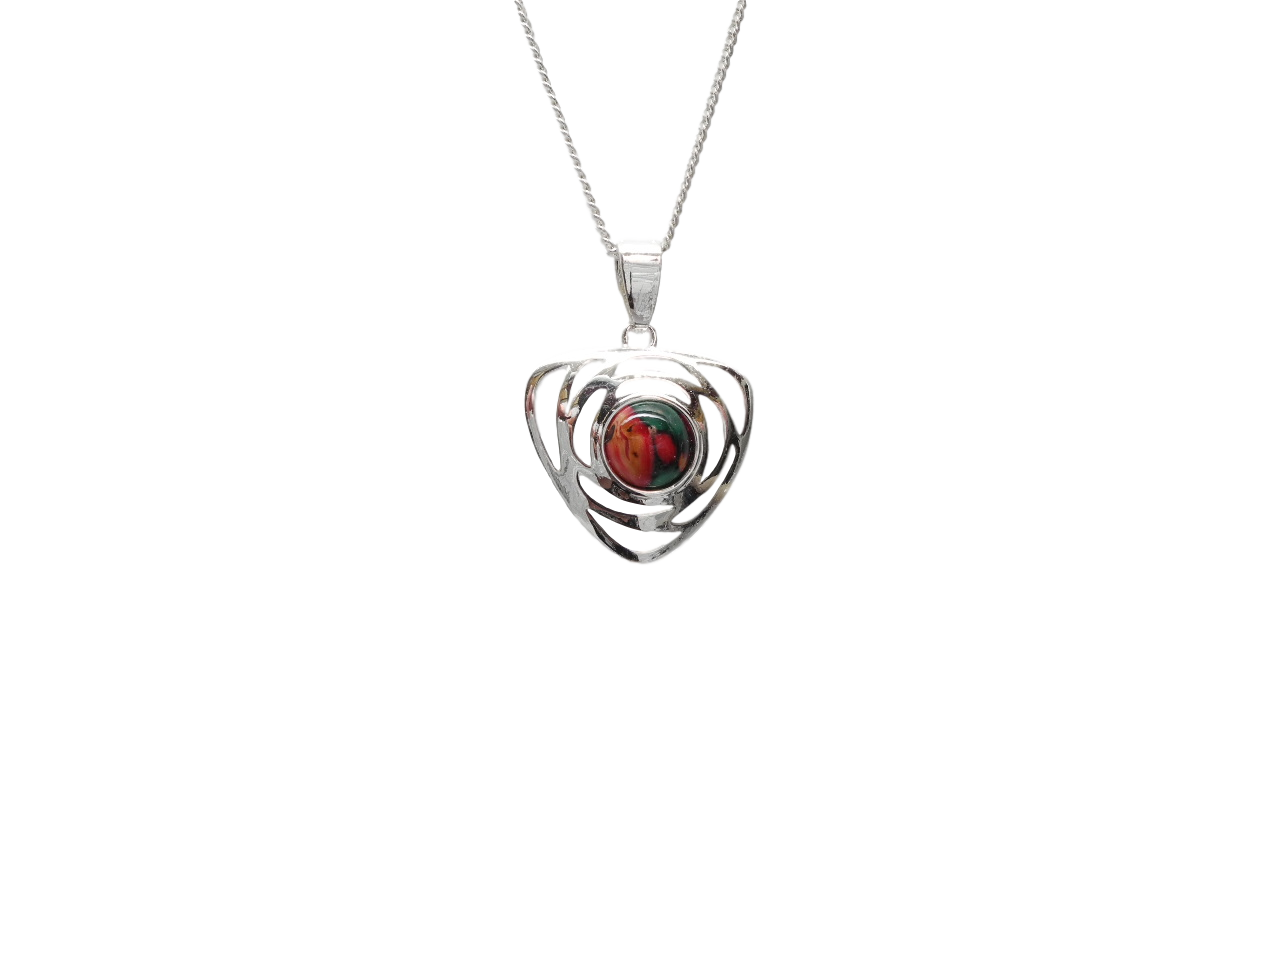 scottish pendant necklace heathergem comrie